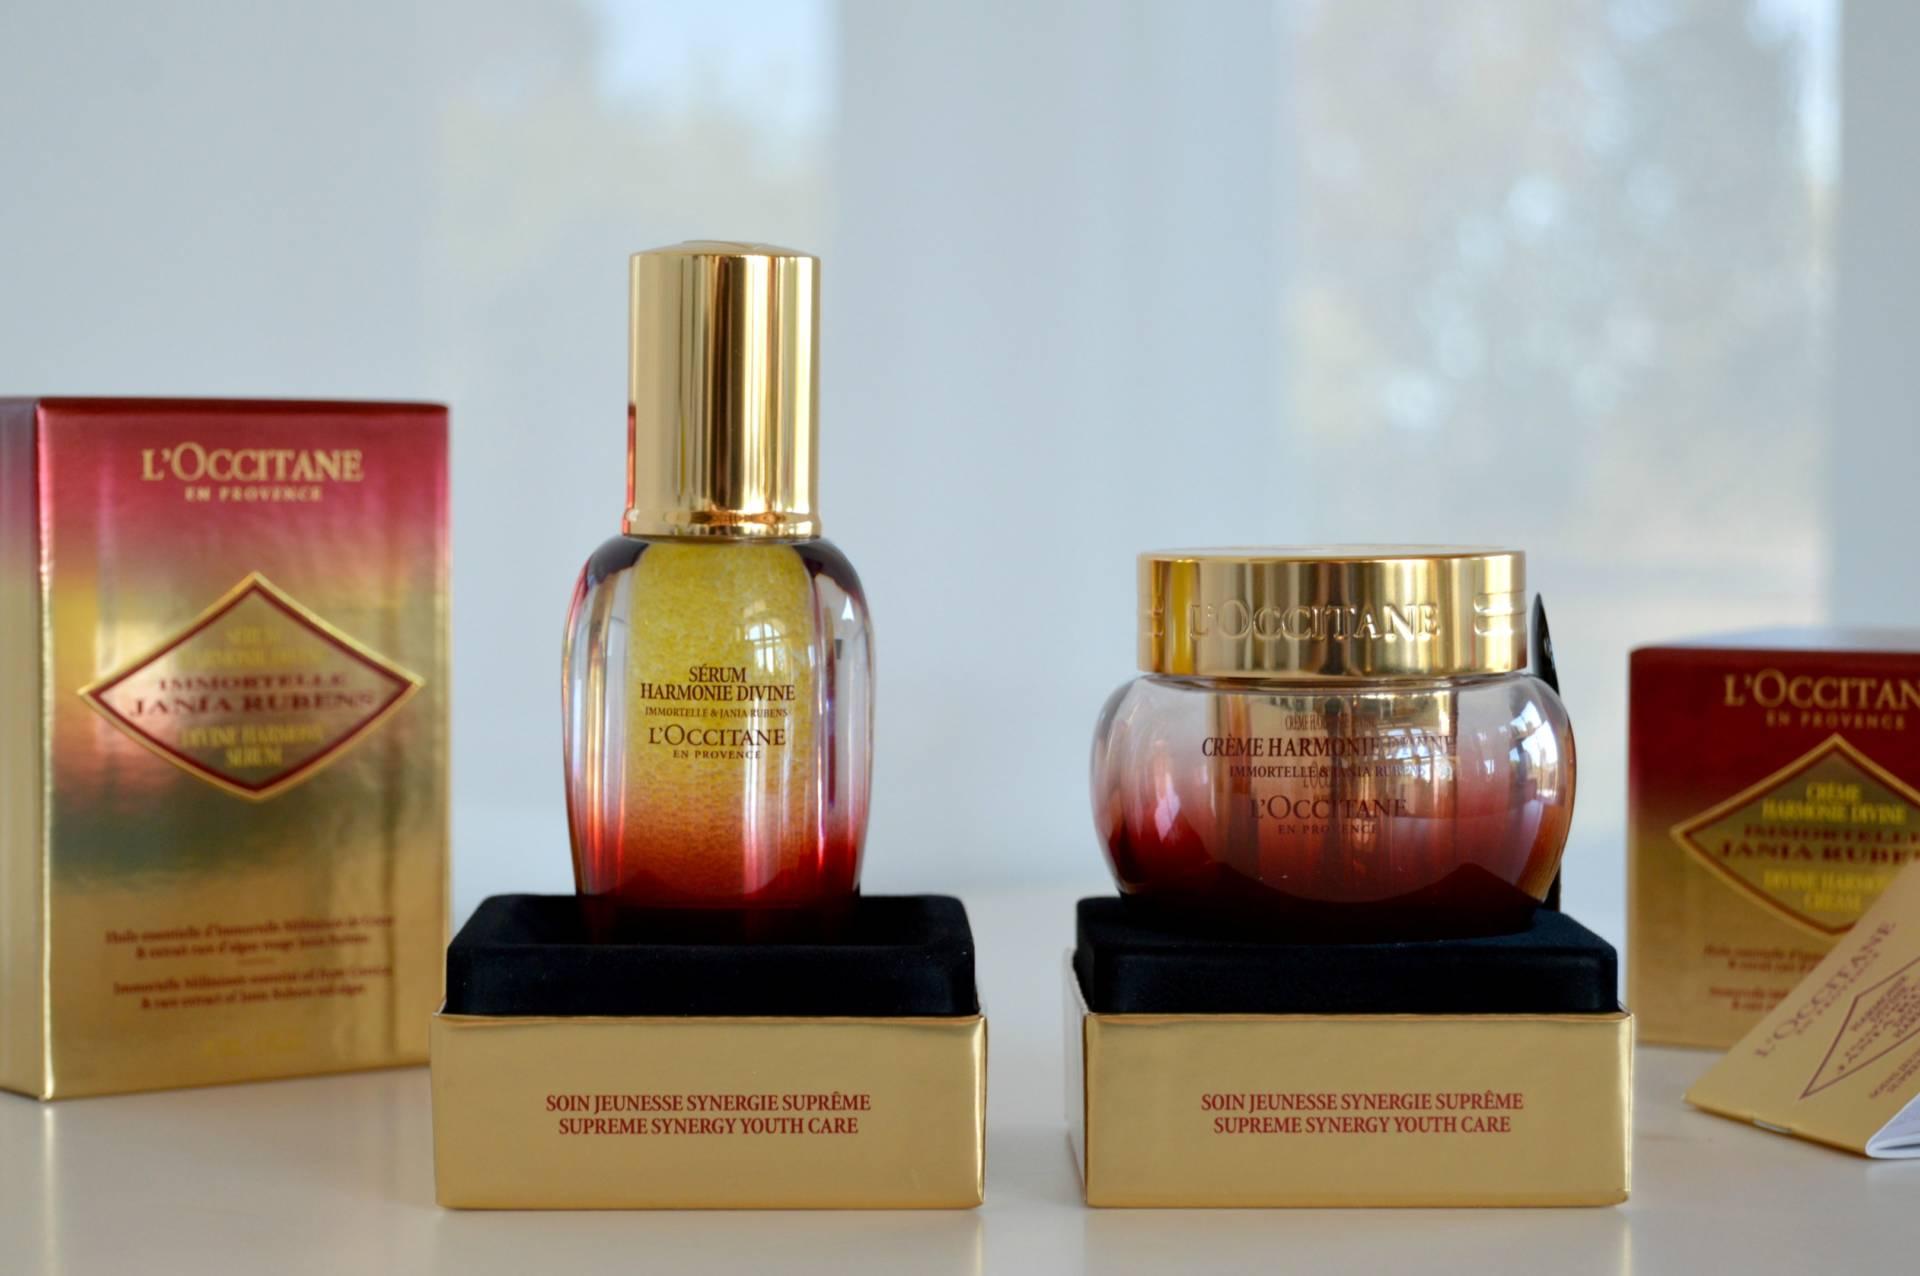 loccitane-harmonie-divine-serum-cream-inhautepursuit-travel-duty-free-shopping-review